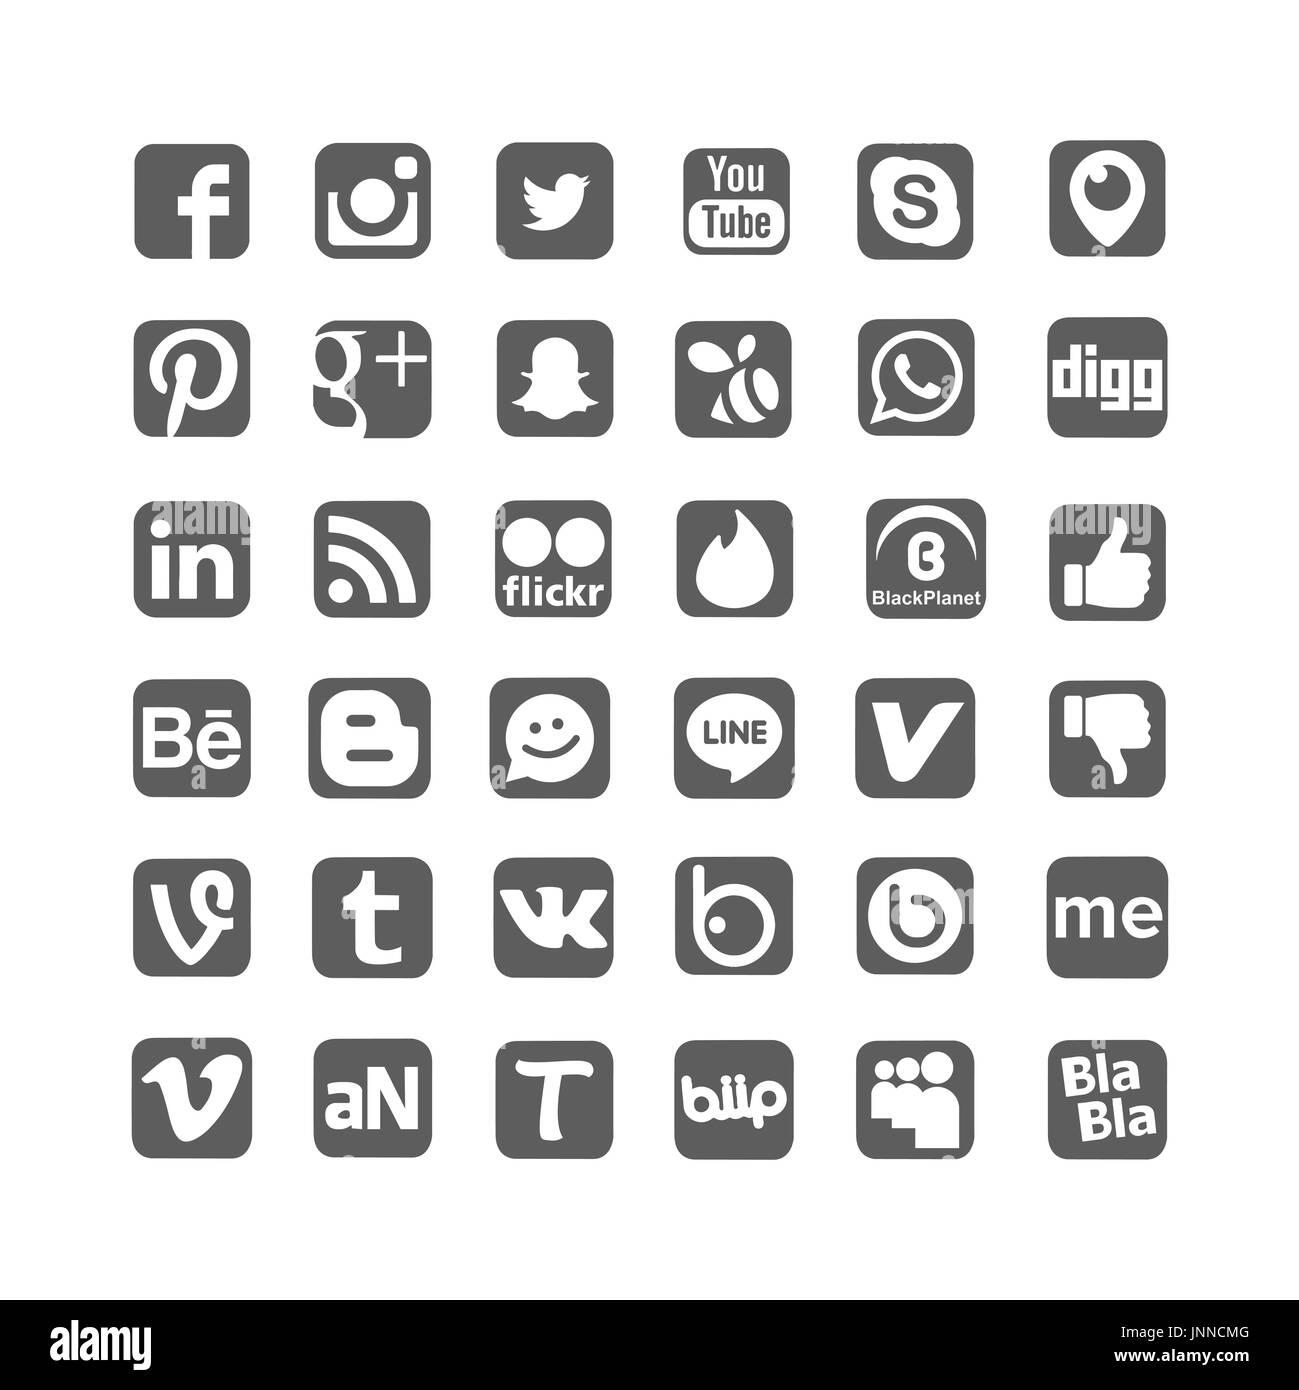 Snapchat Logo Black and White Stock Photos & Images - Alamy